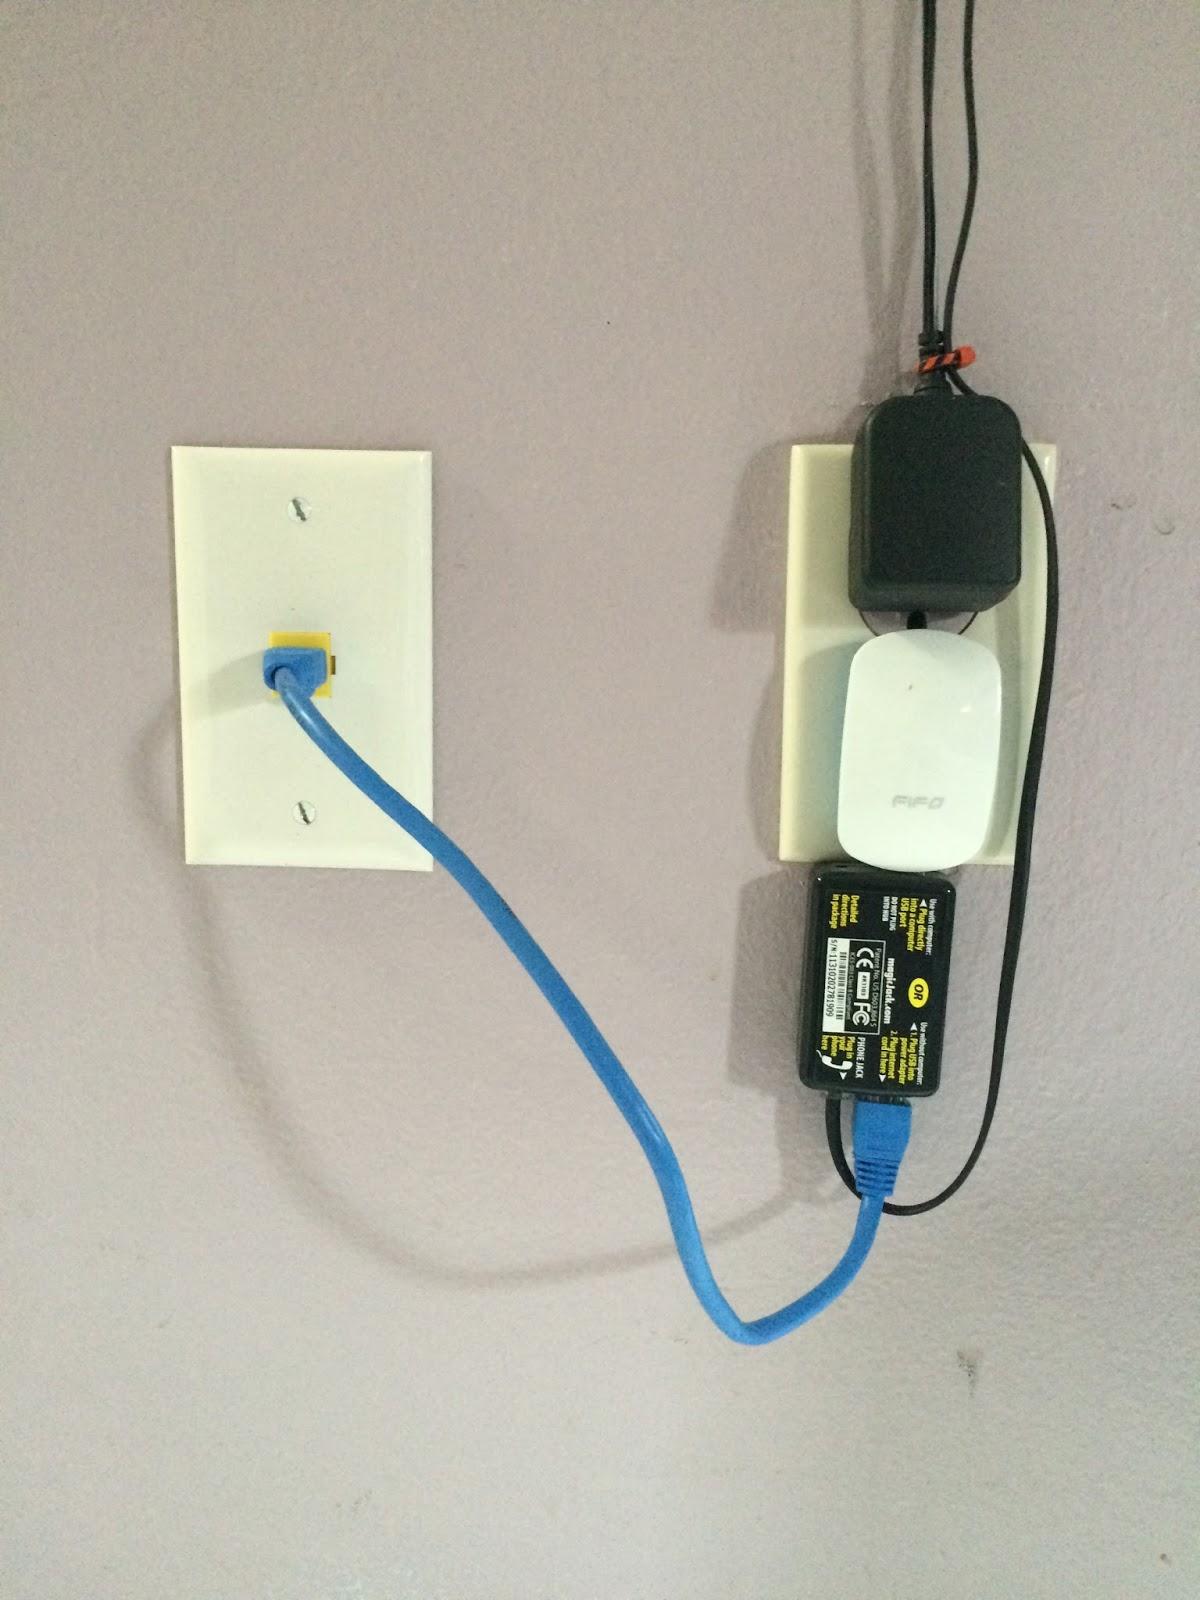 hight resolution of magic jack wiring diagram wiring diagram view magic jack wiring diagram